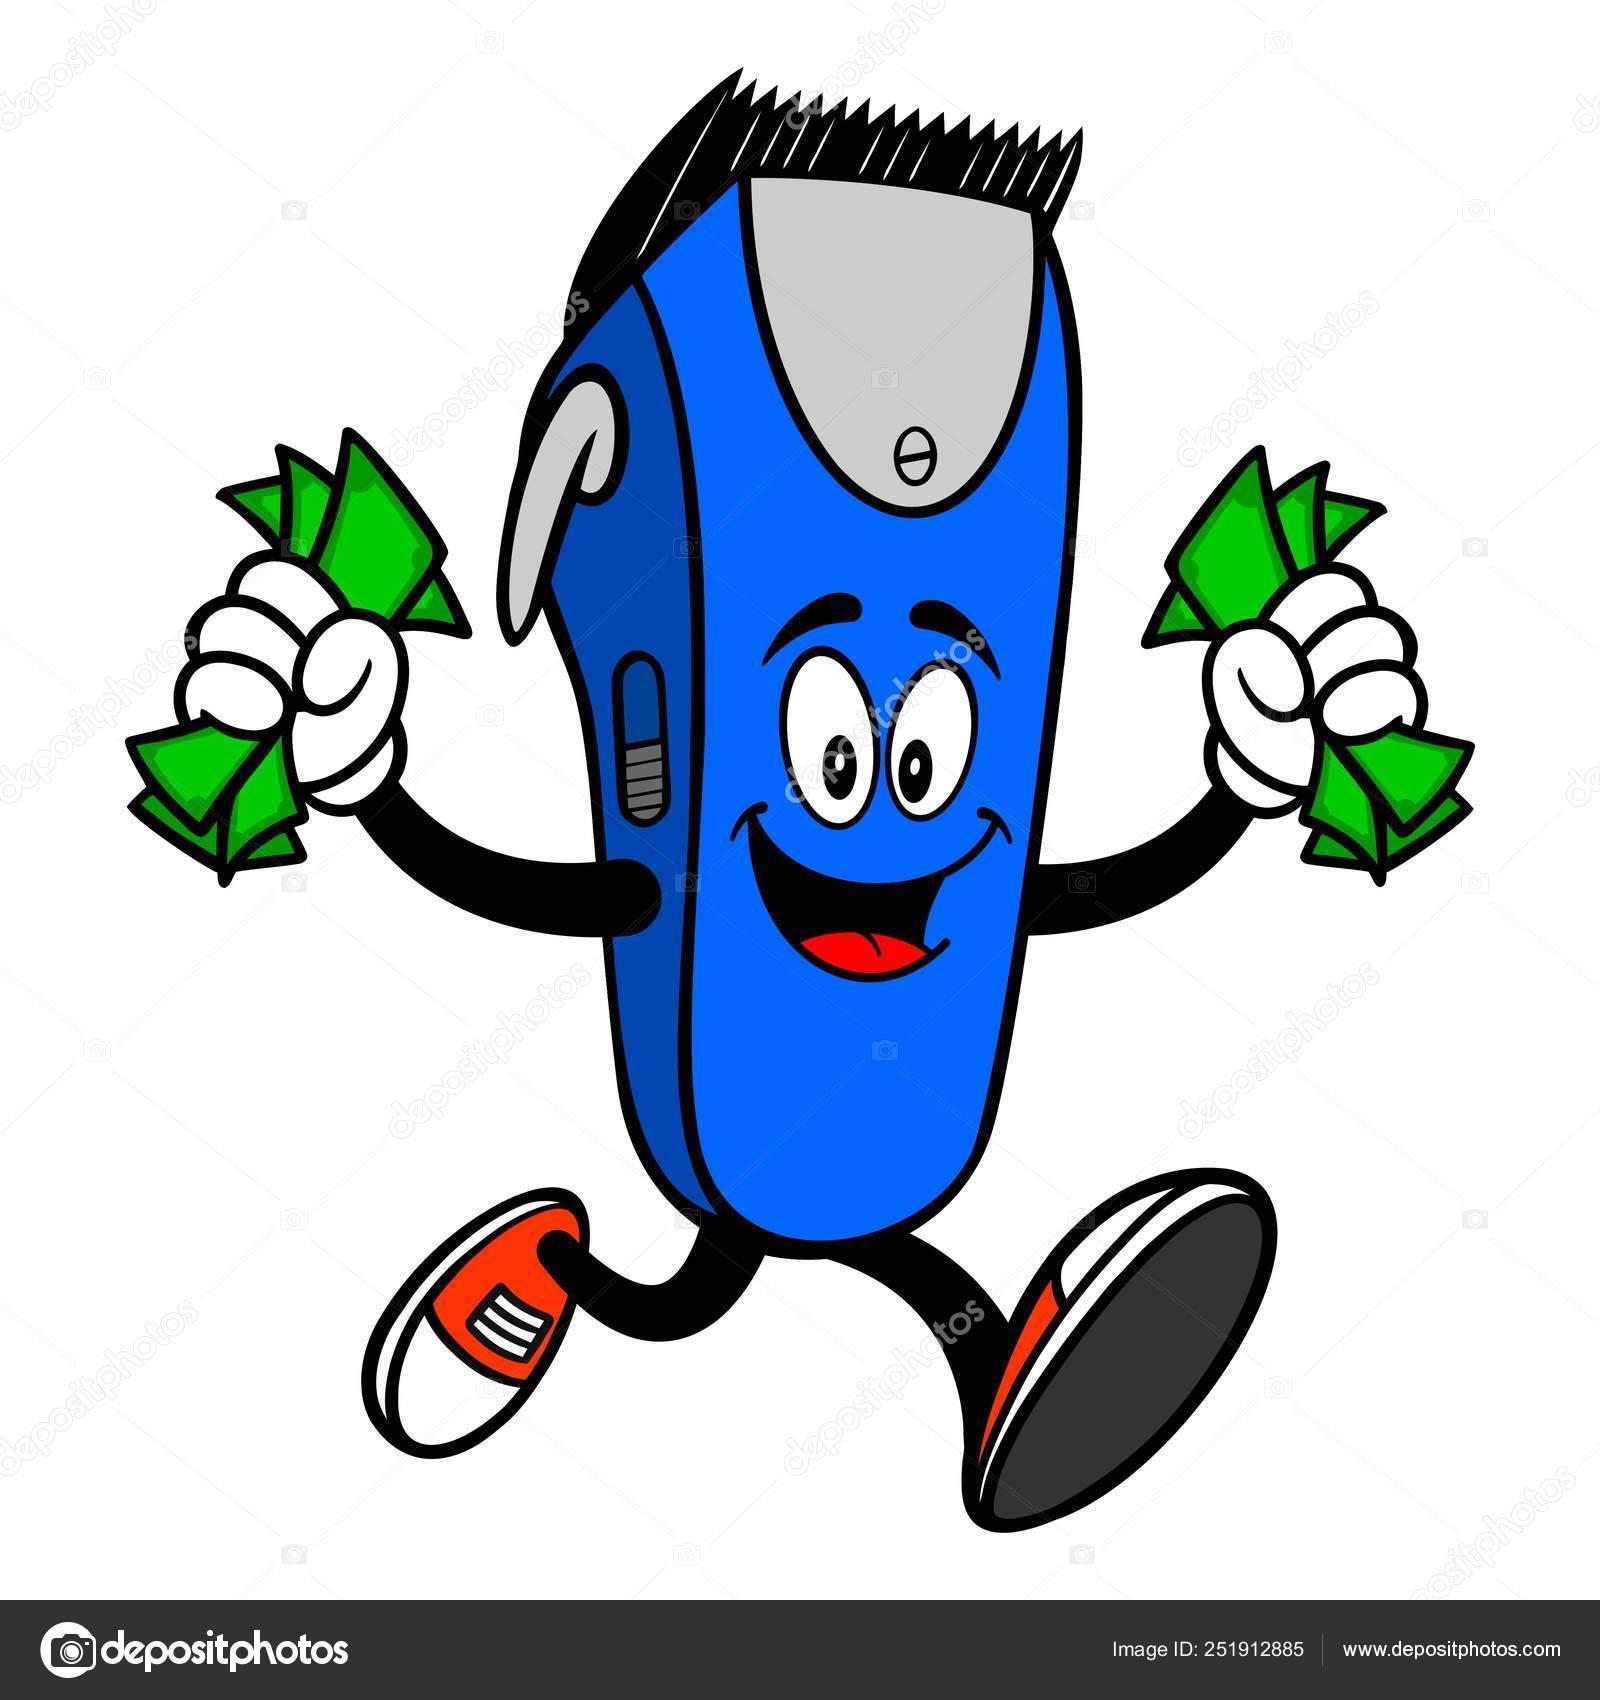 Electrical Hair Clipper Mascot Running Money Vector Cartoon Illustration Barber Stock Vector C Larryrains 251912885